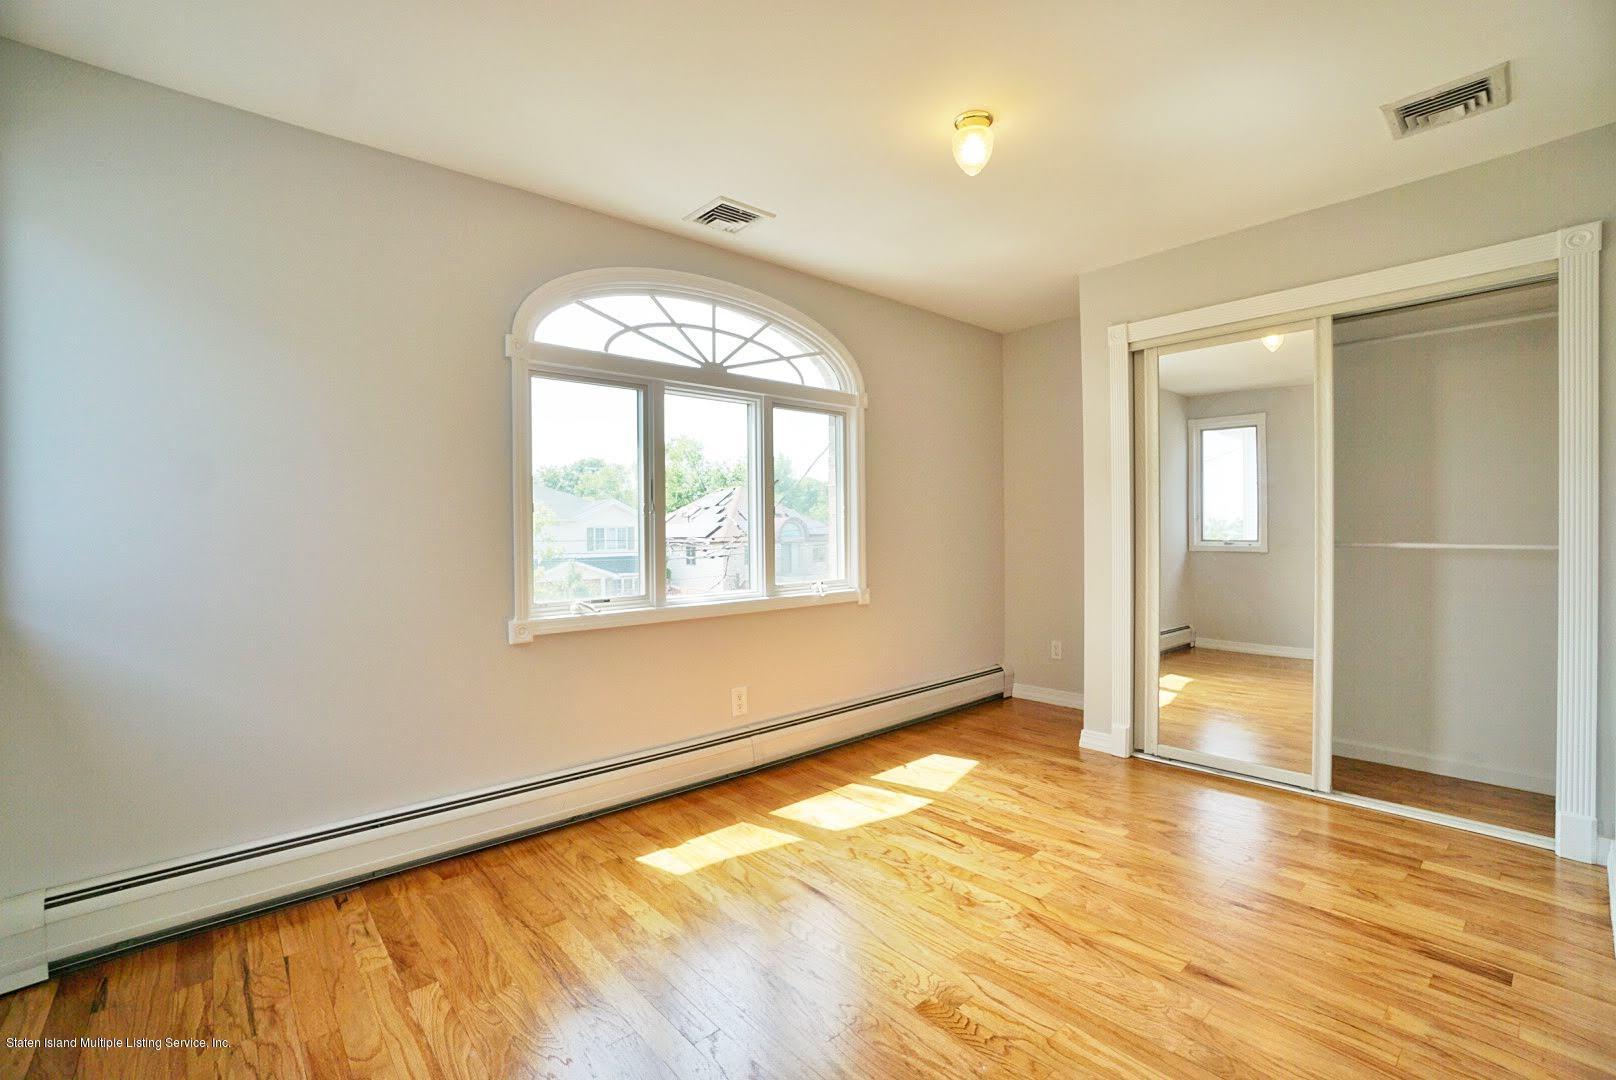 Single Family - Detached 445 Manhattan Street  Staten Island, NY 10307, MLS-1130505-22